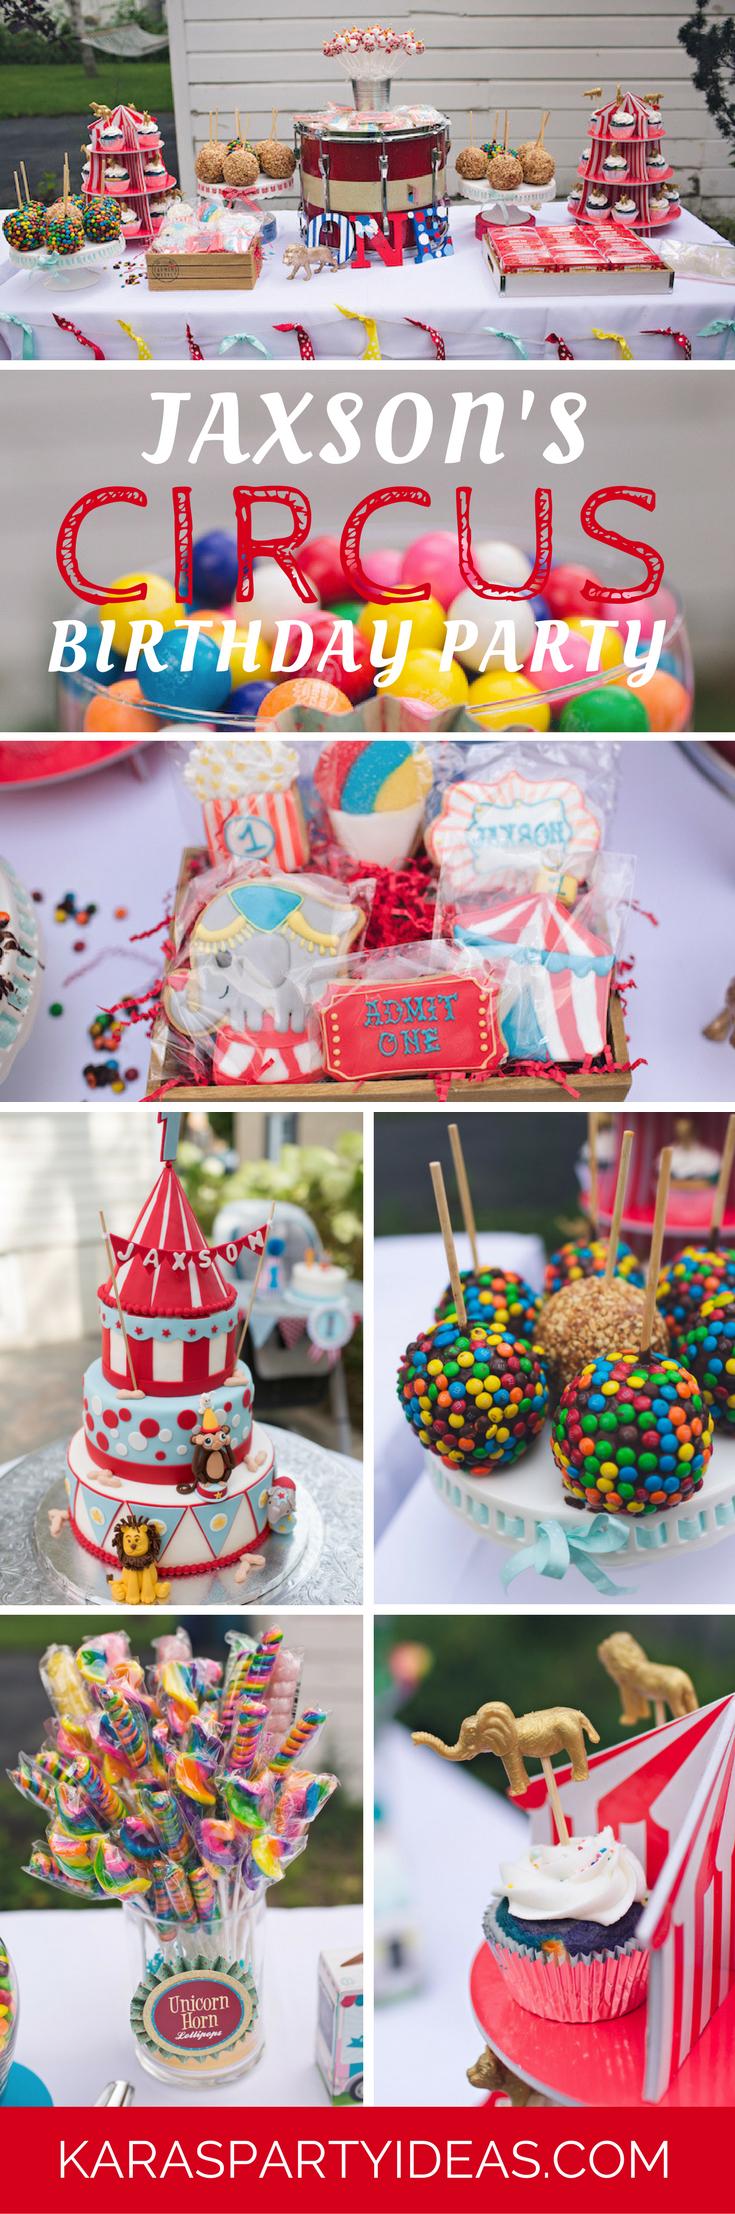 Jaxsons Circus Birthday Party - Karas Party Ideas via KarasPartyIdeas.com